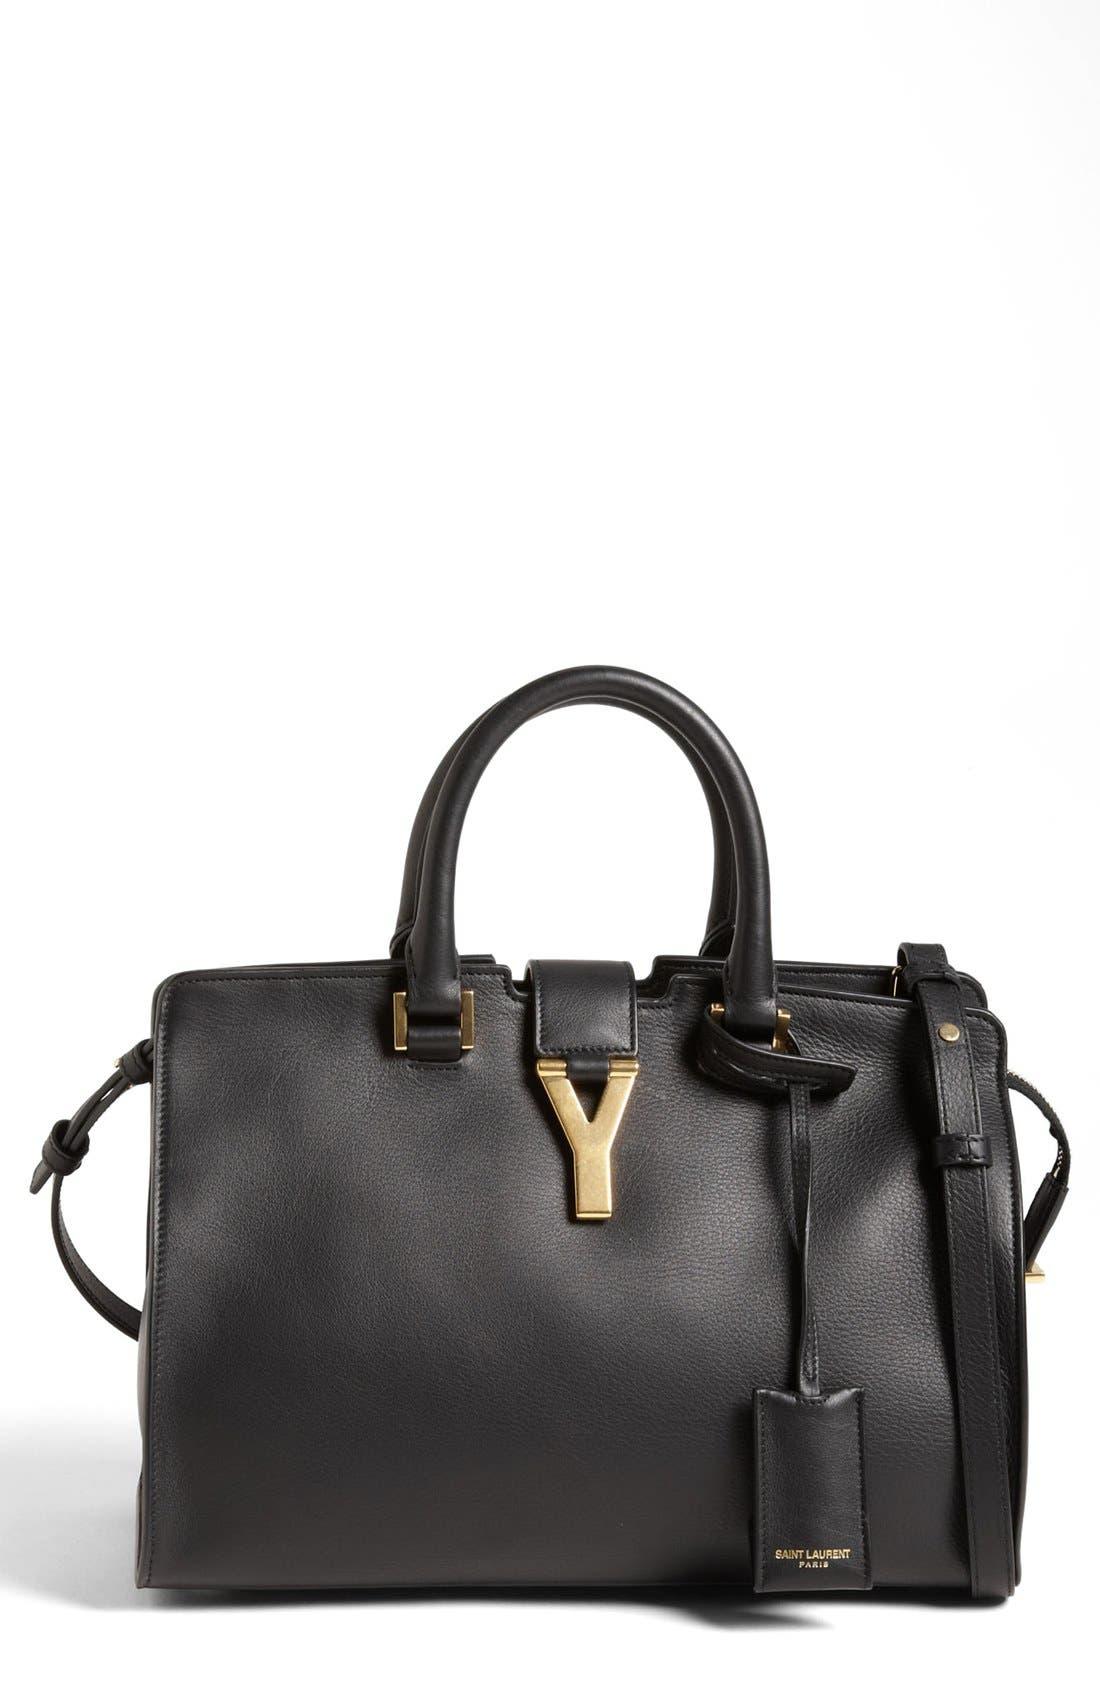 Main Image - Saint Laurent 'Petite Ligne Y' Leather Tote